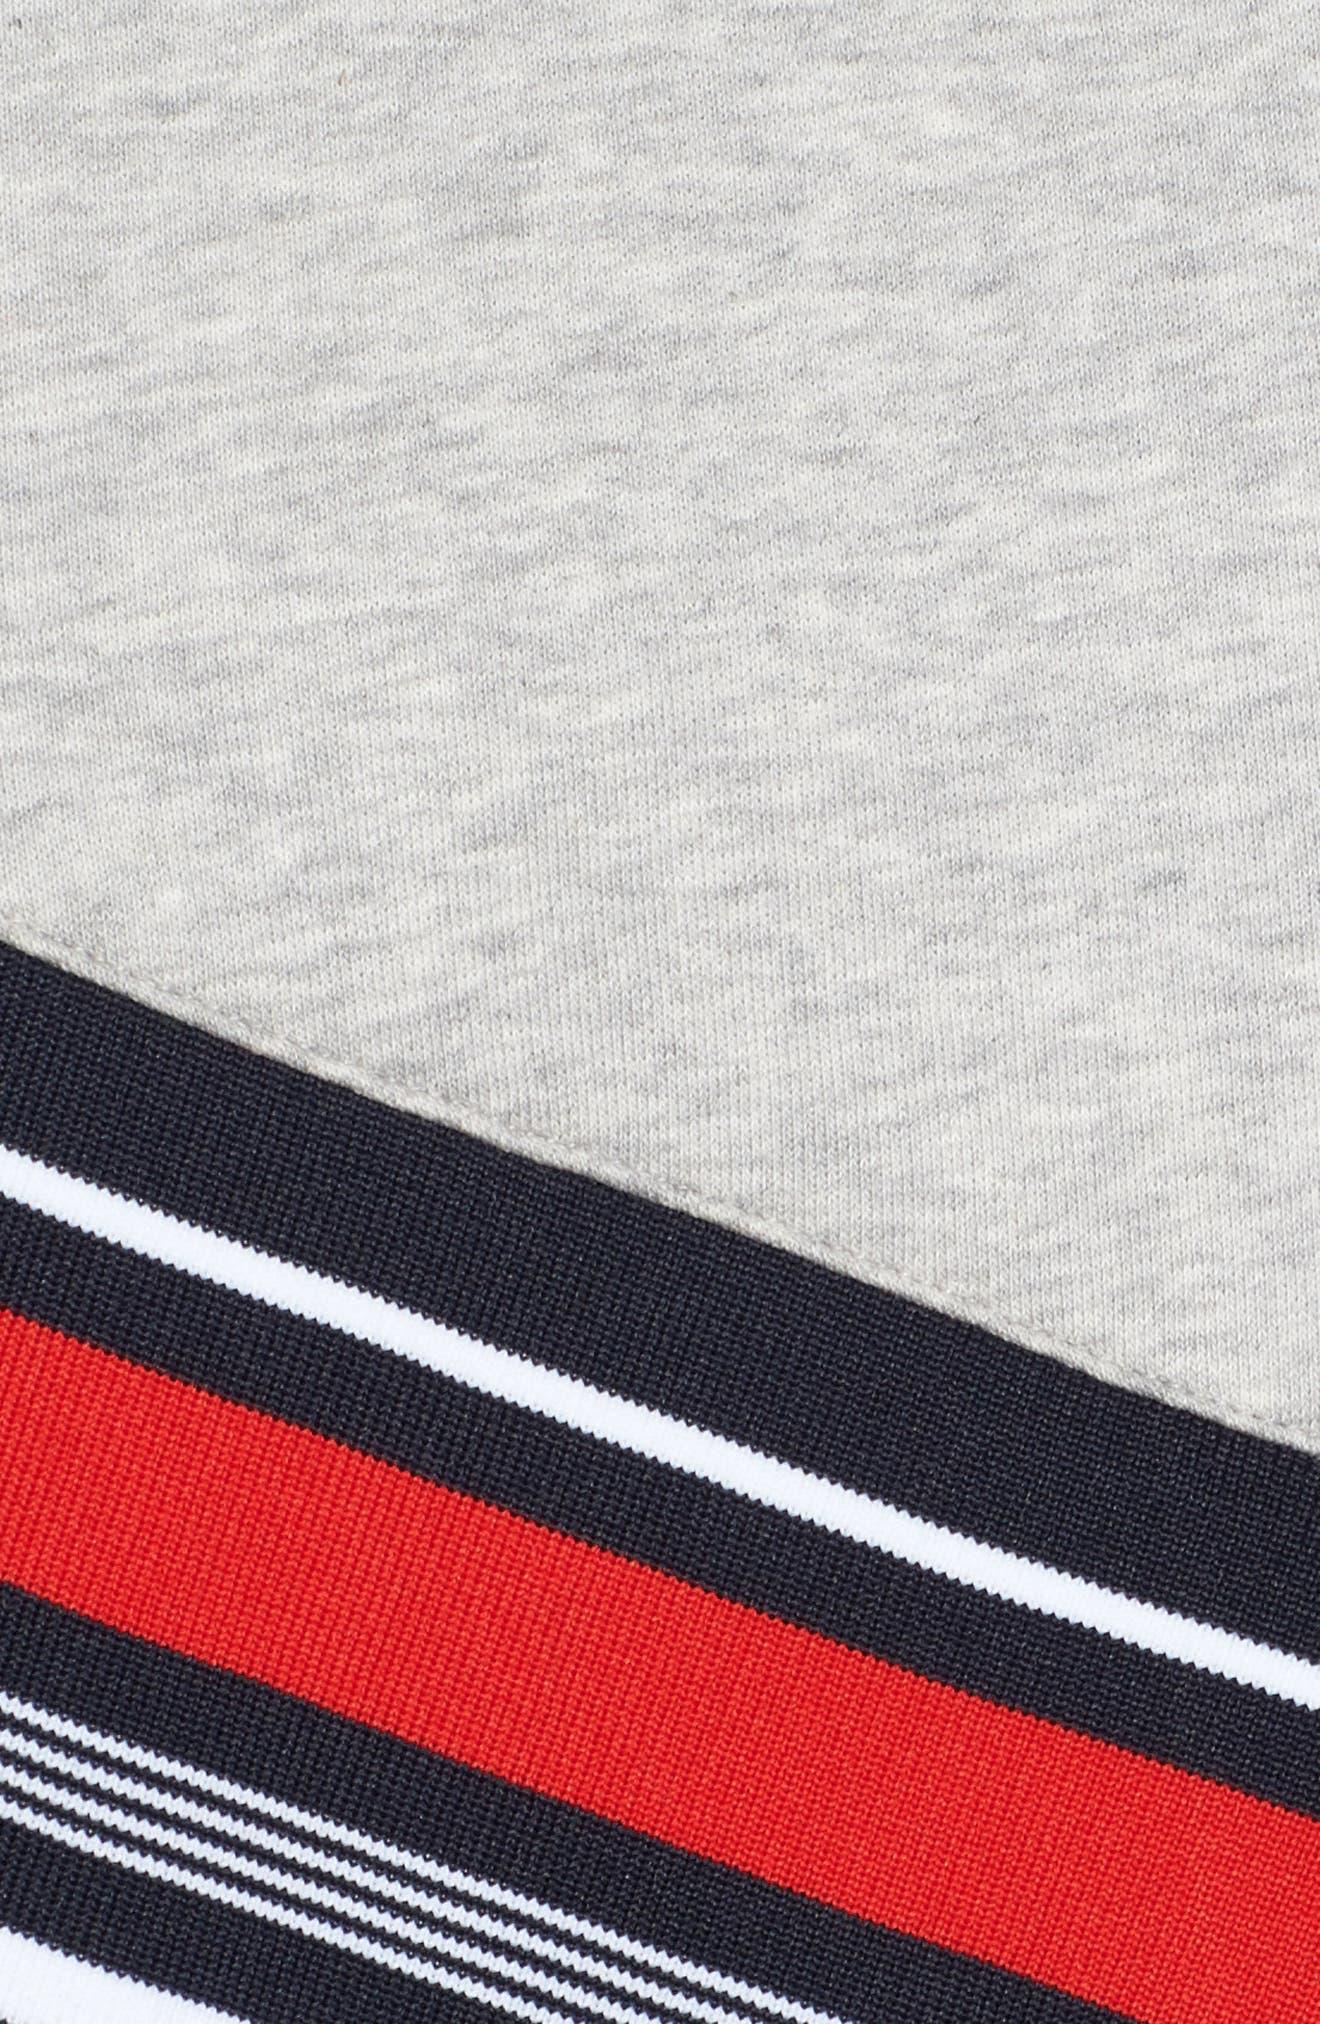 x Gigi Hadid Racing Sweatshirt Dress,                             Alternate thumbnail 5, color,                             Midnight/ Hthr